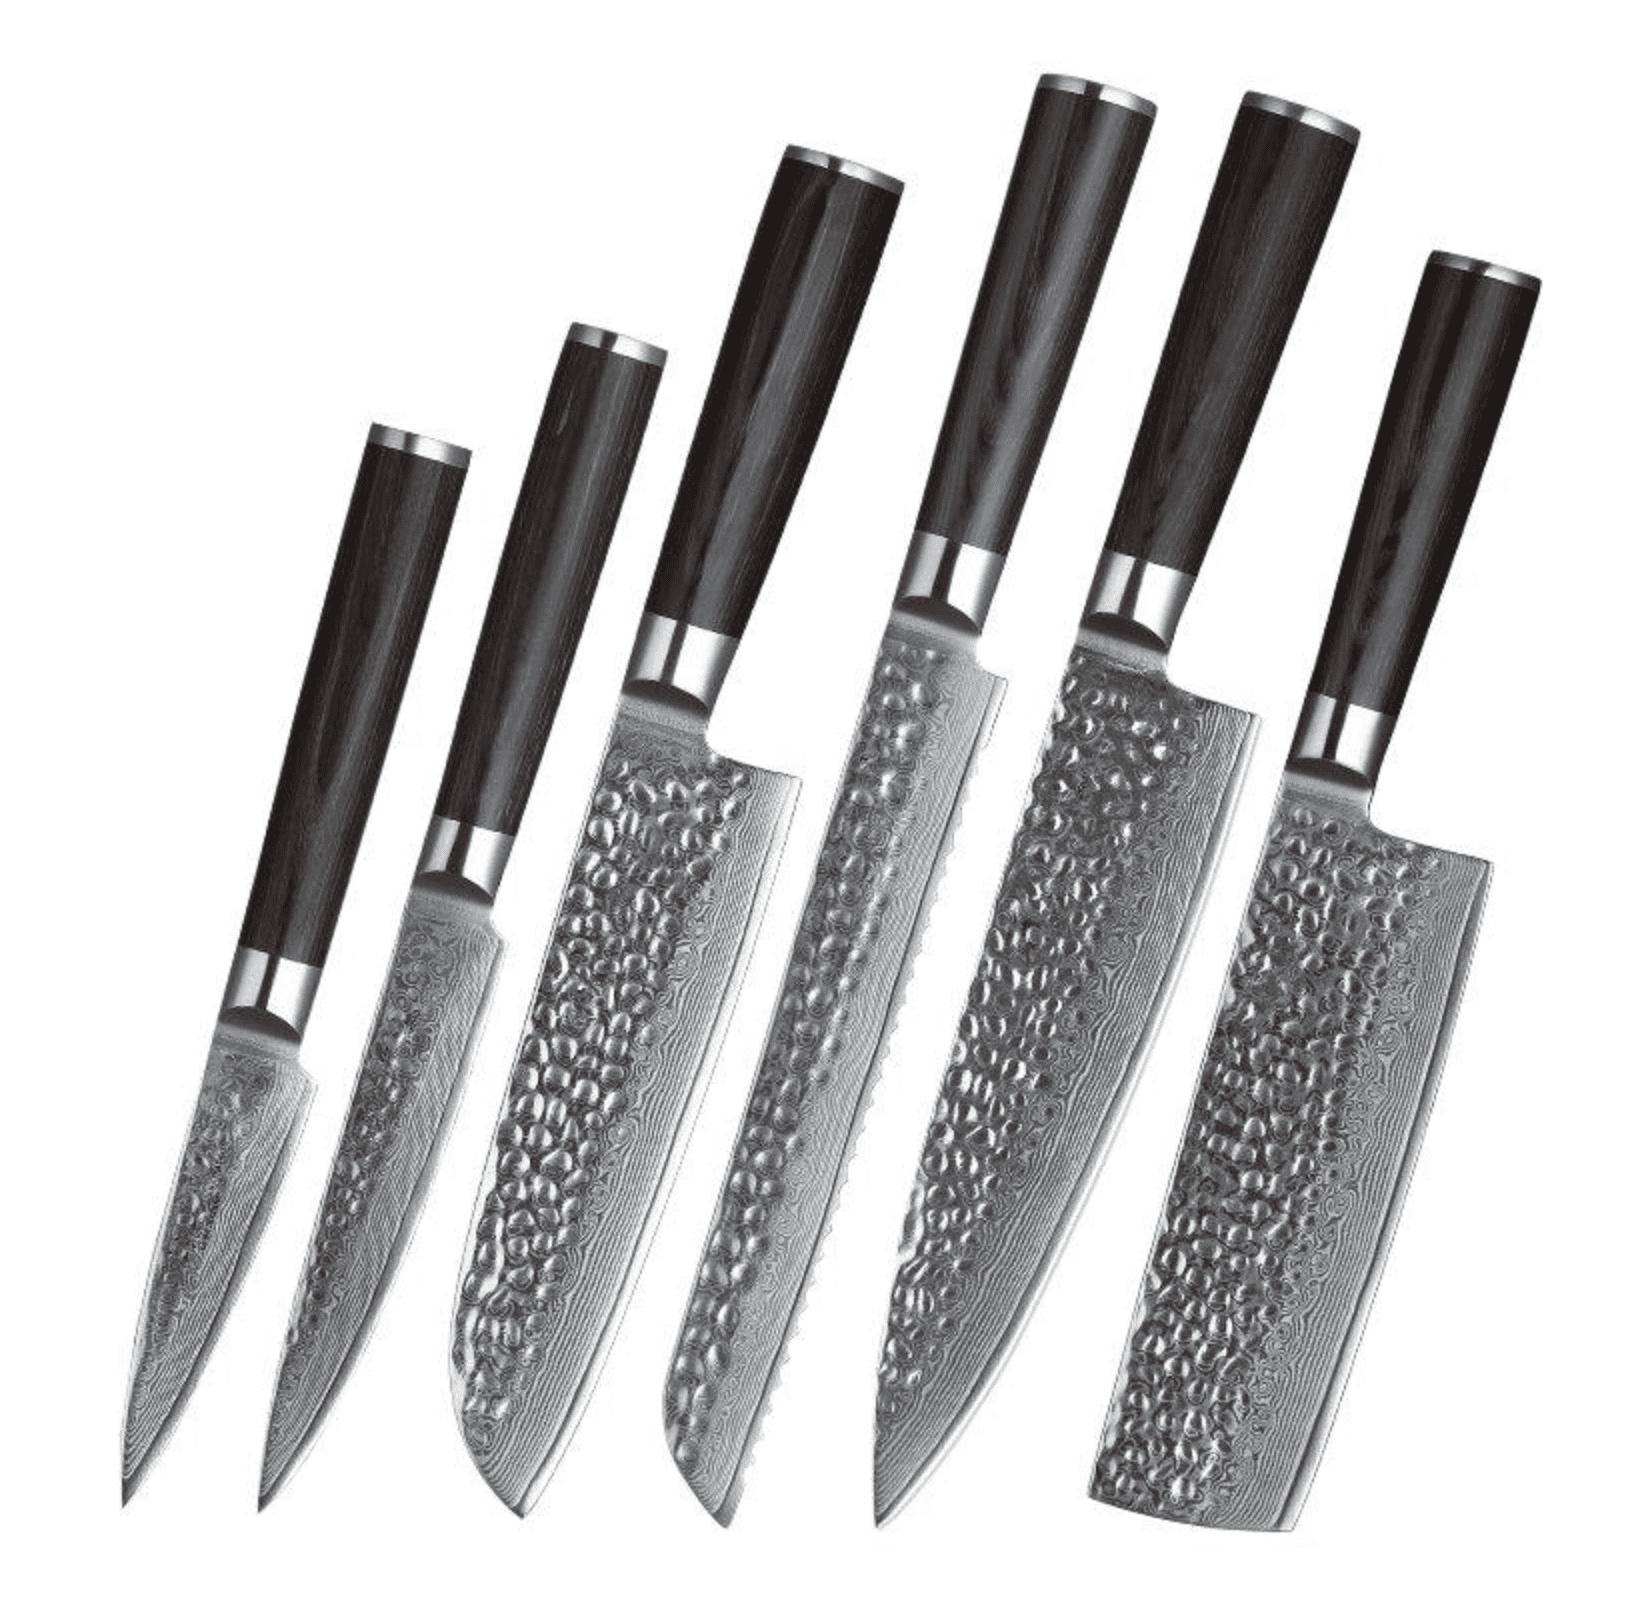 Japanske Køkkenknive